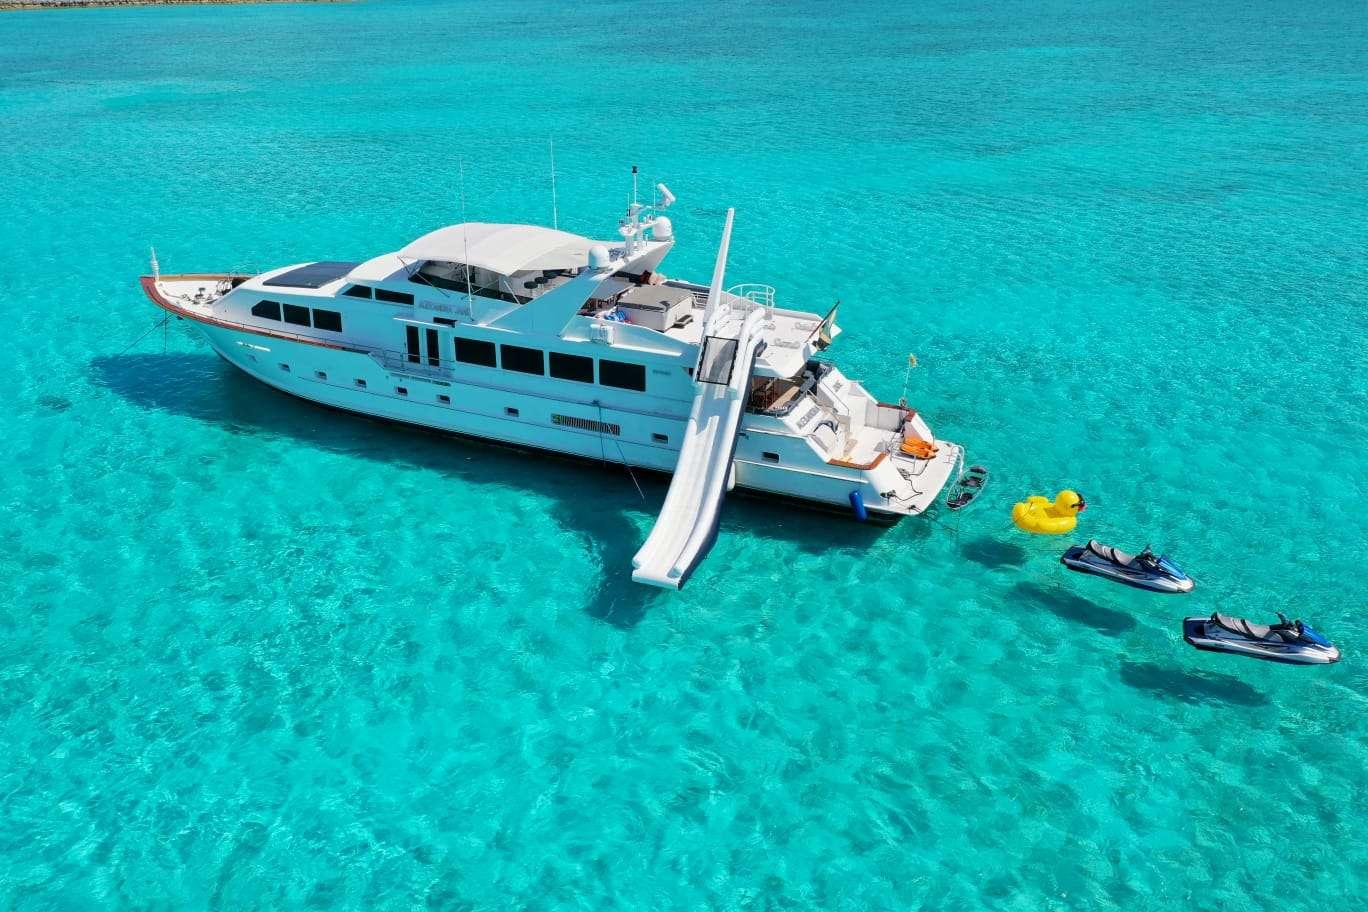 Motor Yacht 'ALEXANDRA JANE', 10 PAX, 4 Crew, 110.00 Ft, 33.00 Meters, Built 1995, Broward, Refit Year 2019